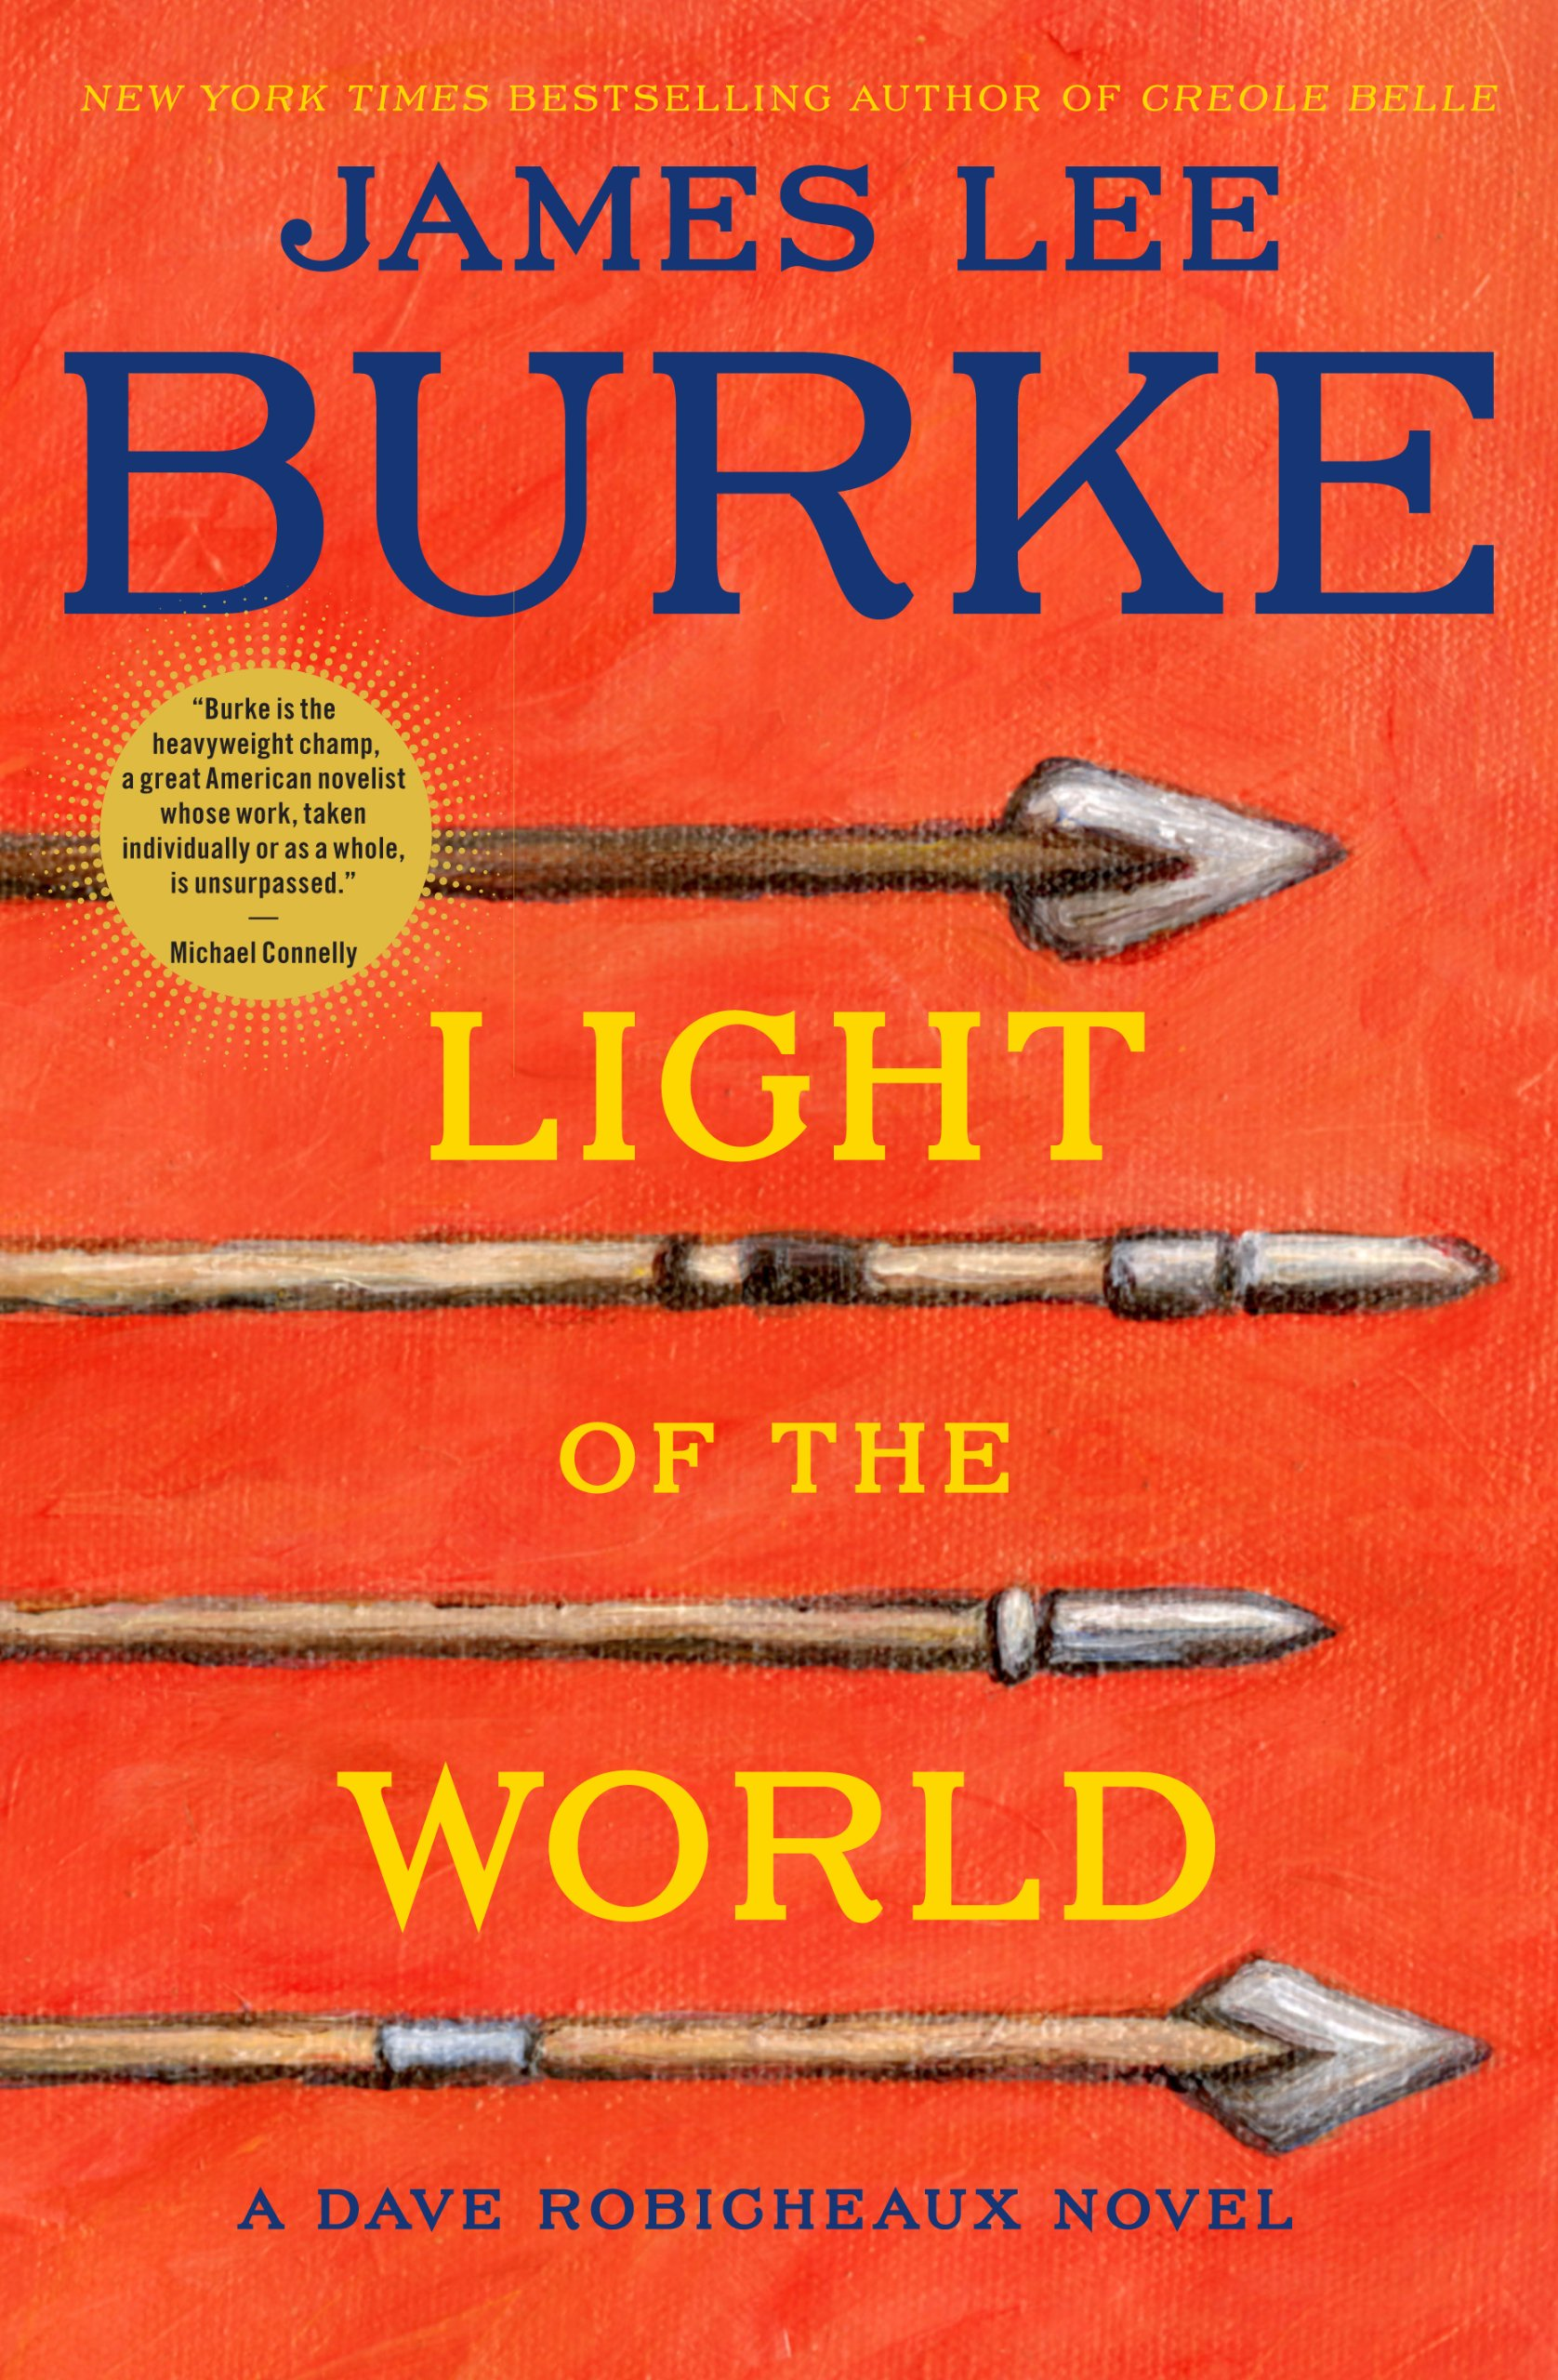 Light Of The World (a Dave Robicheaux Novel): James Lee Burke:  9781410459879: Amazon: Books